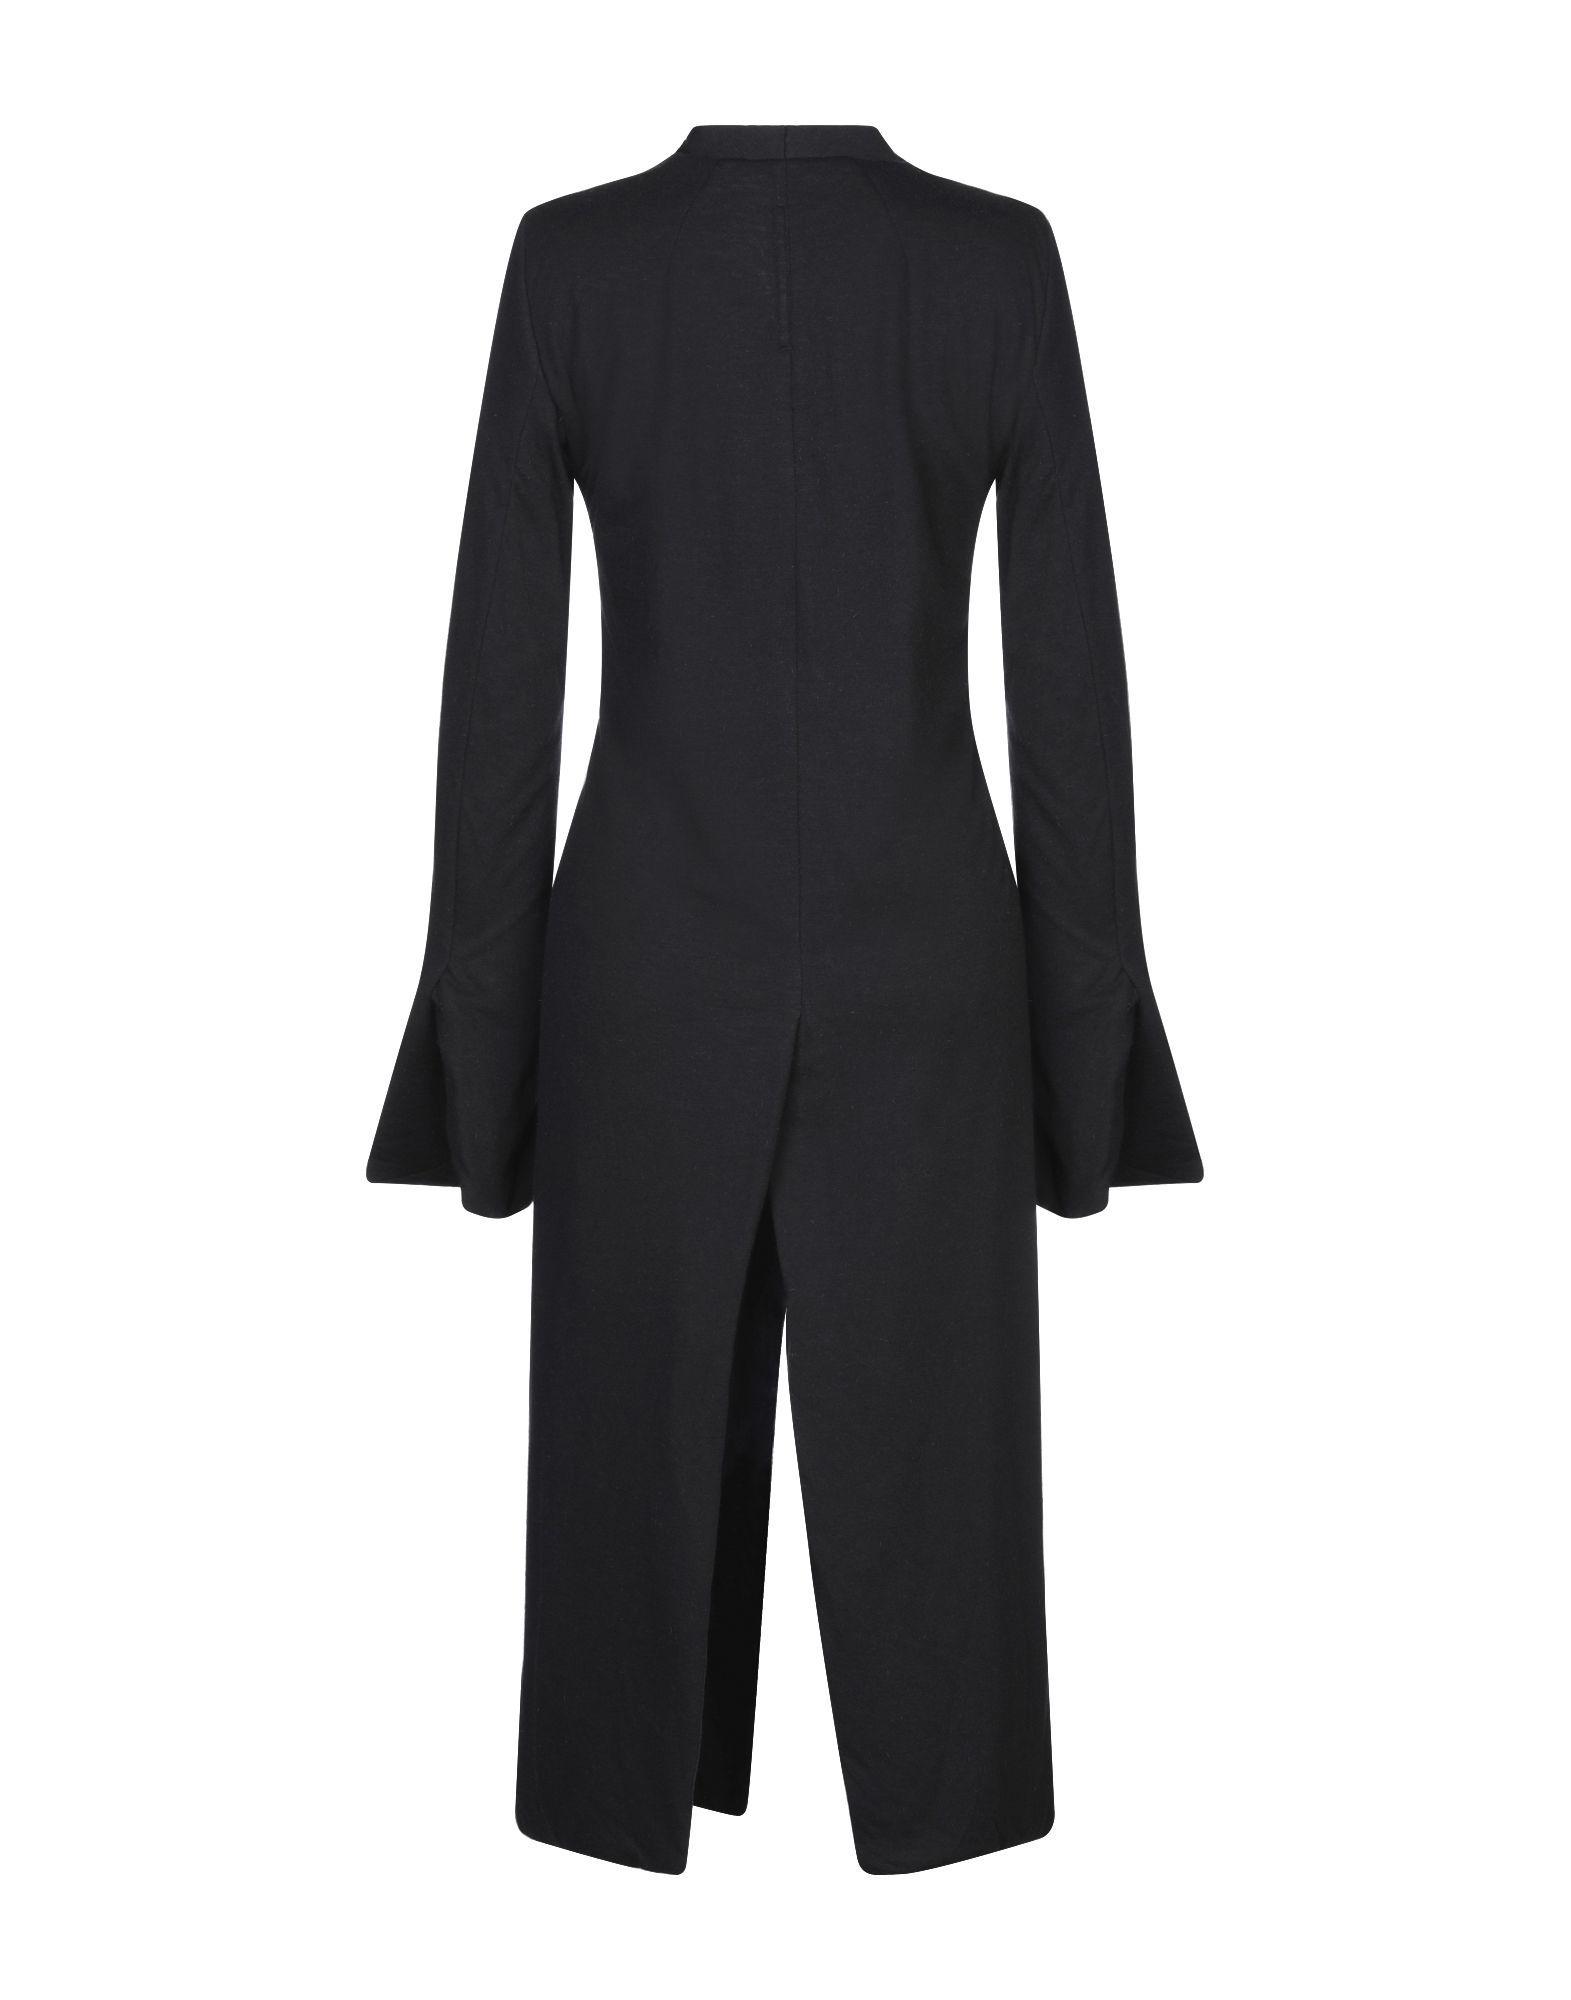 Rick Owens Black Flare Sleeve Wrap Coat